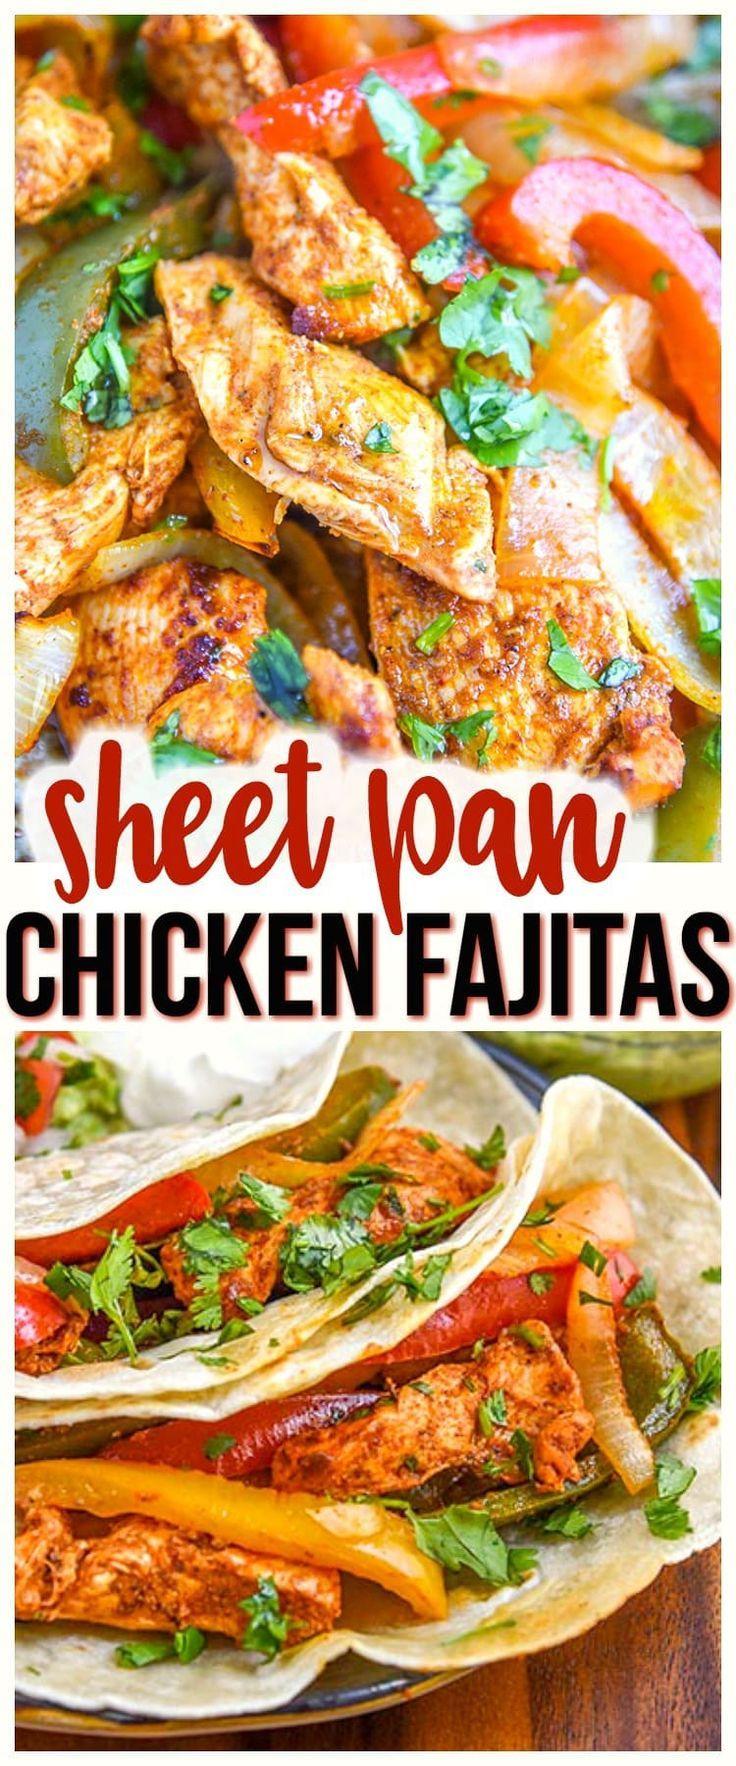 Chicken Fajitas Make For A Great Weeknight Dinner Learn How To Make Chicken Fajitas That Cook Up Quickly Without M Fajita Recipe Chicken Fajita Recipe Recipes